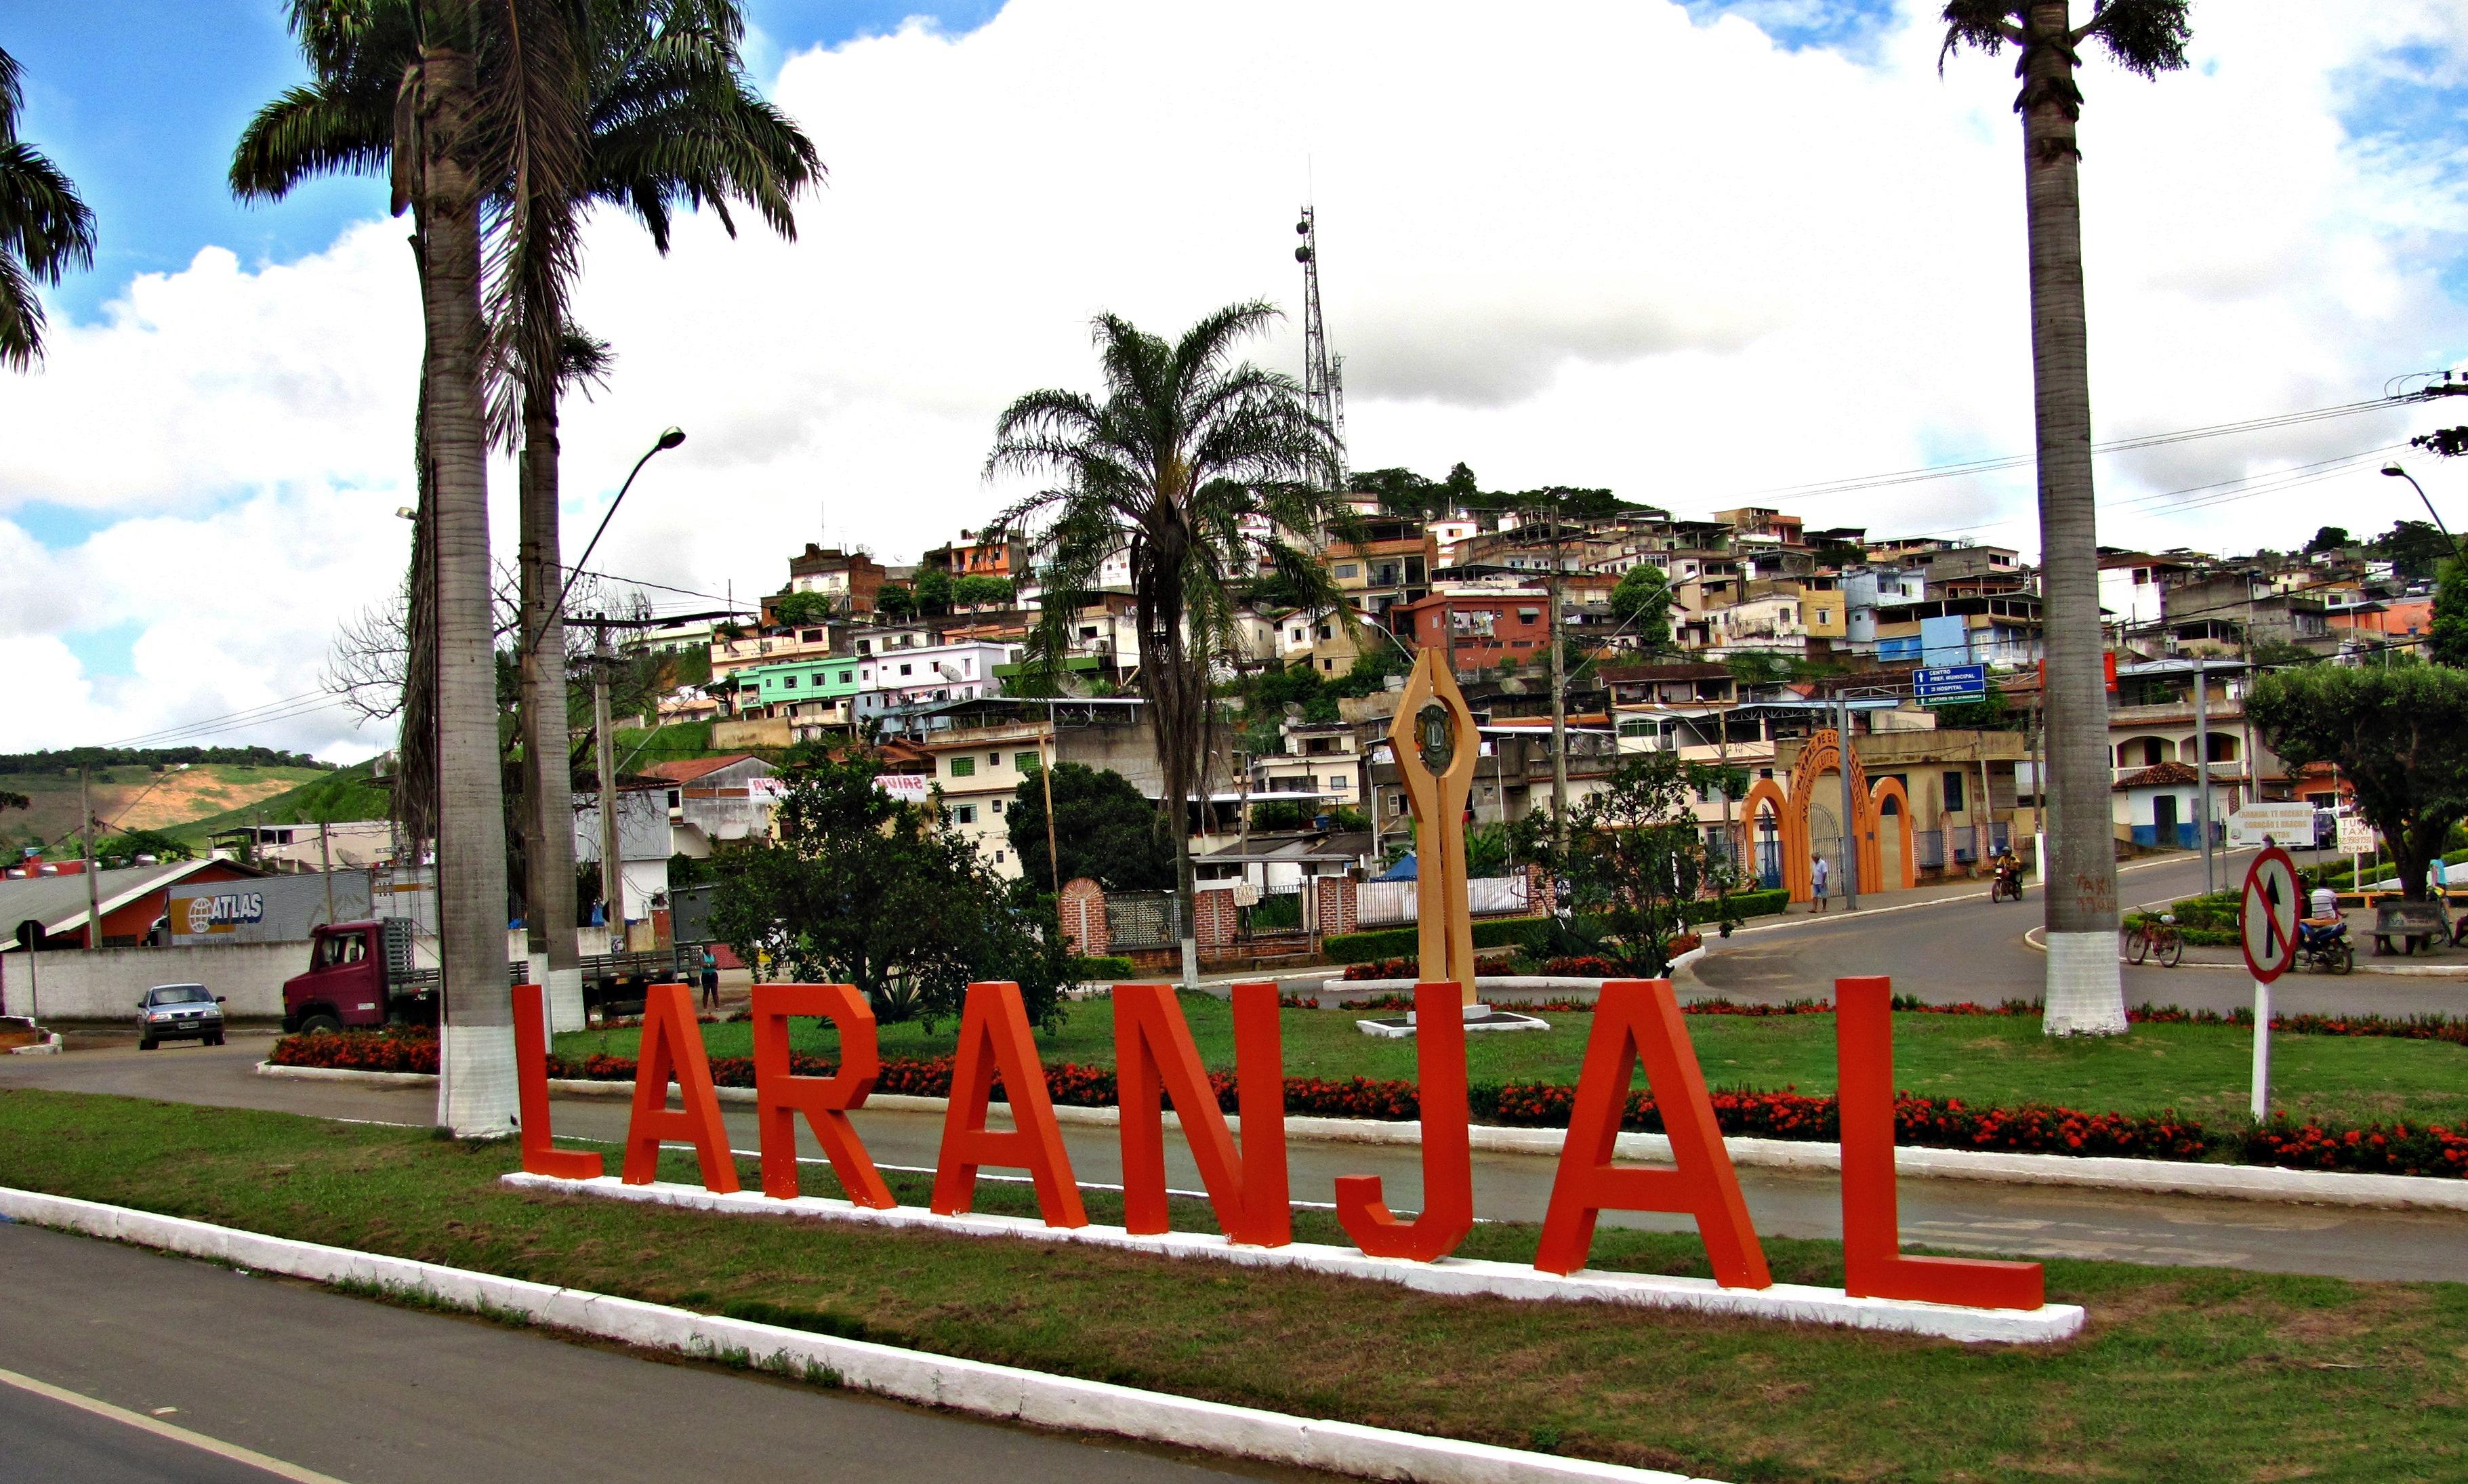 Laranjal (Minas Gerais)